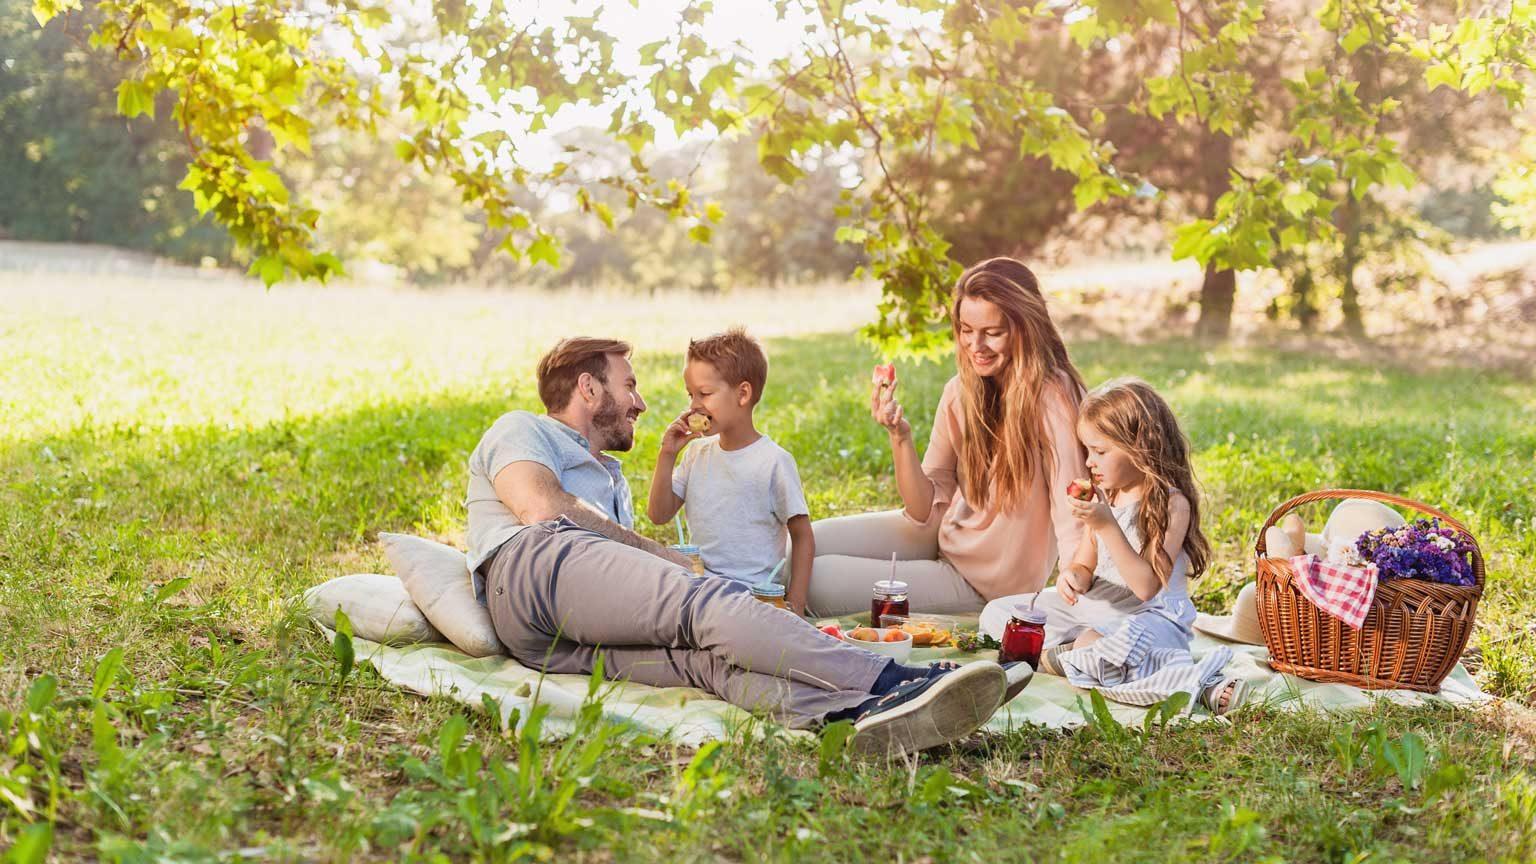 Family enjoying summer picnic